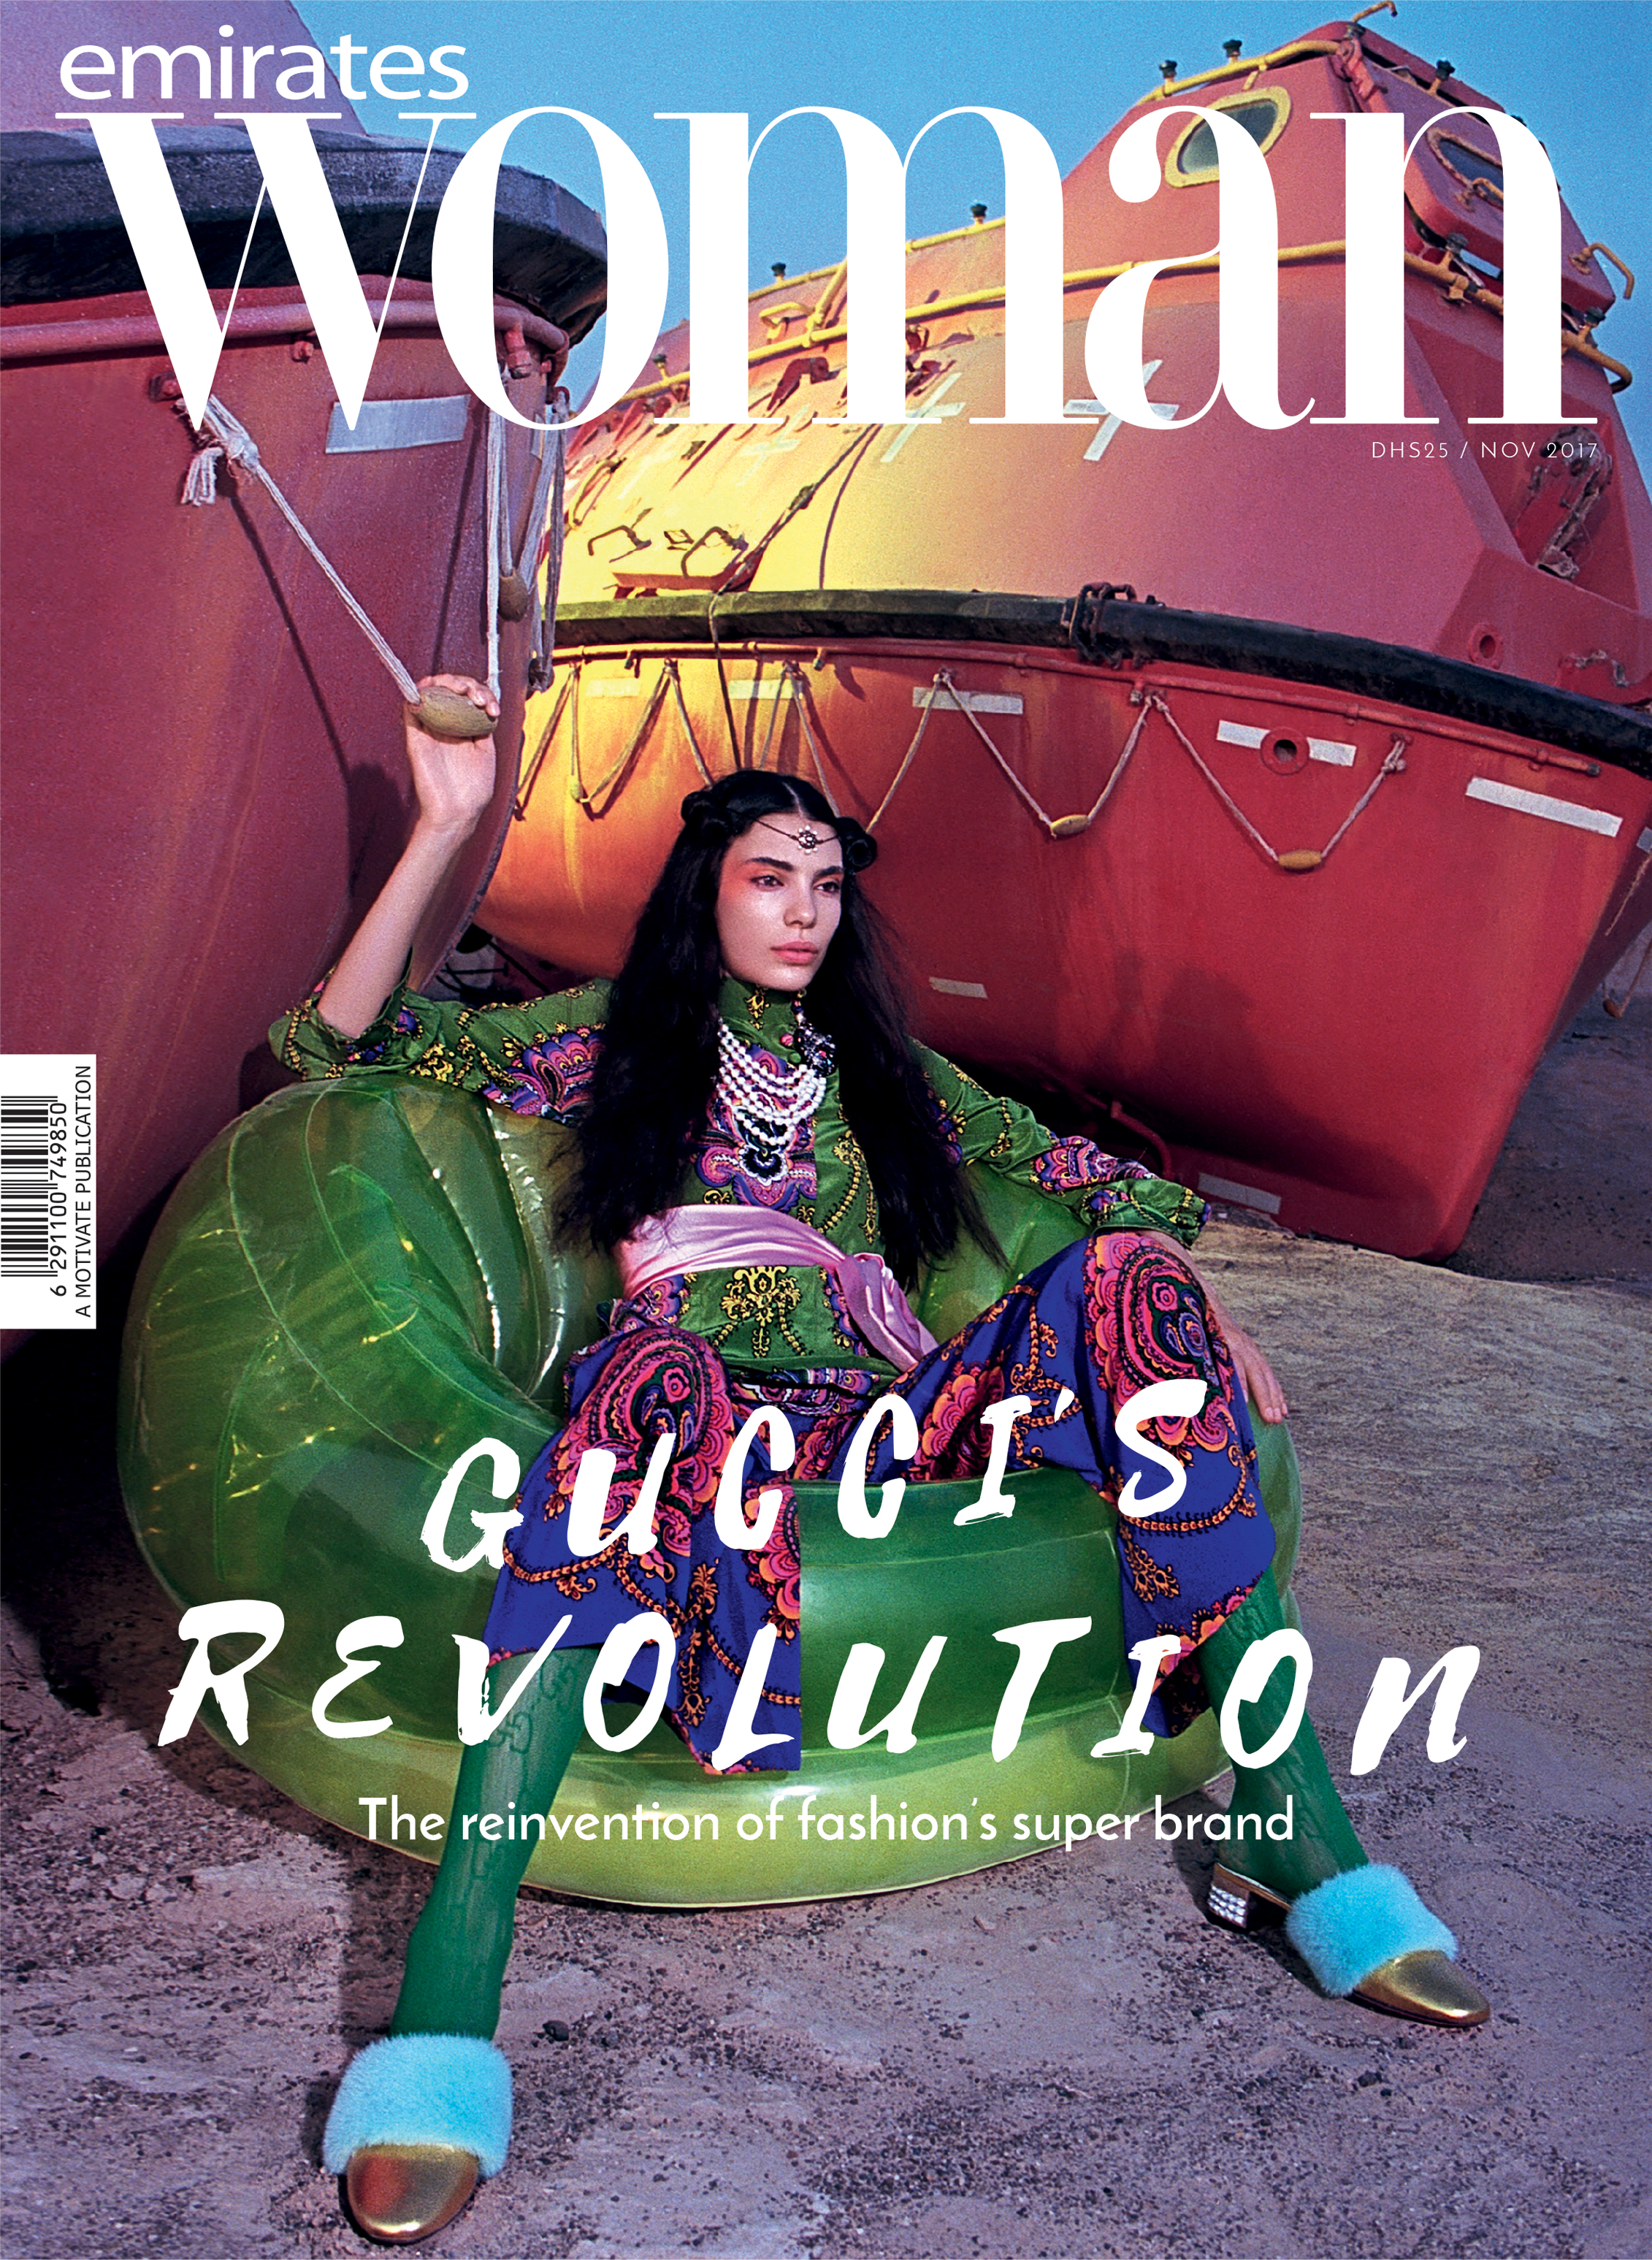 Gucci - Emirates Woman